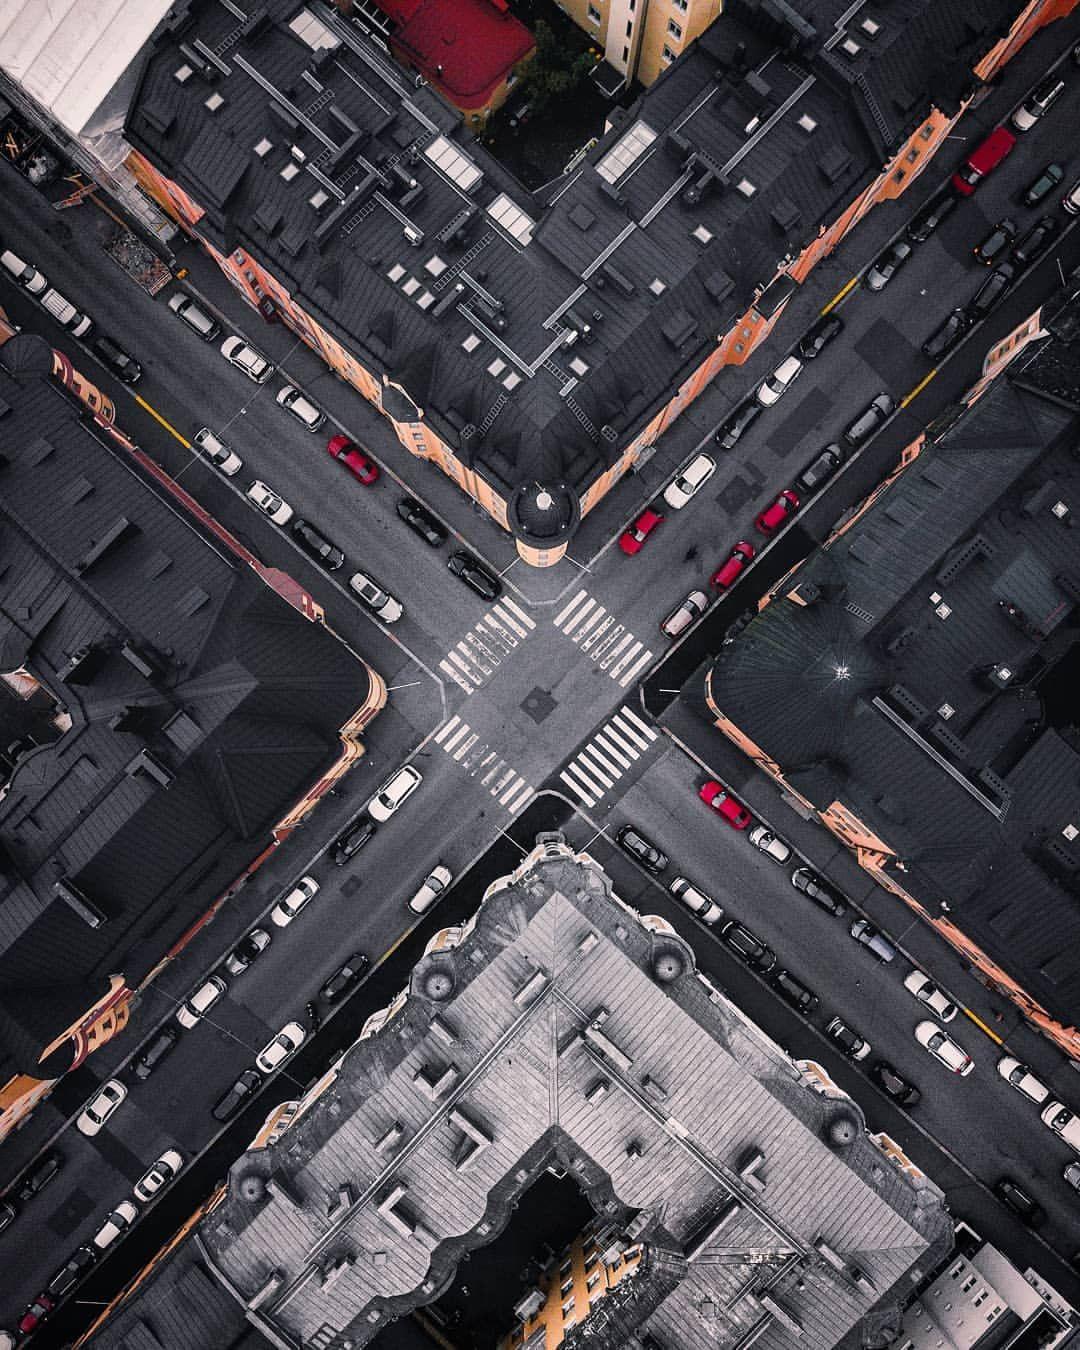 Kristo Vedenoja Captures Spectaculal Urban Scenes In